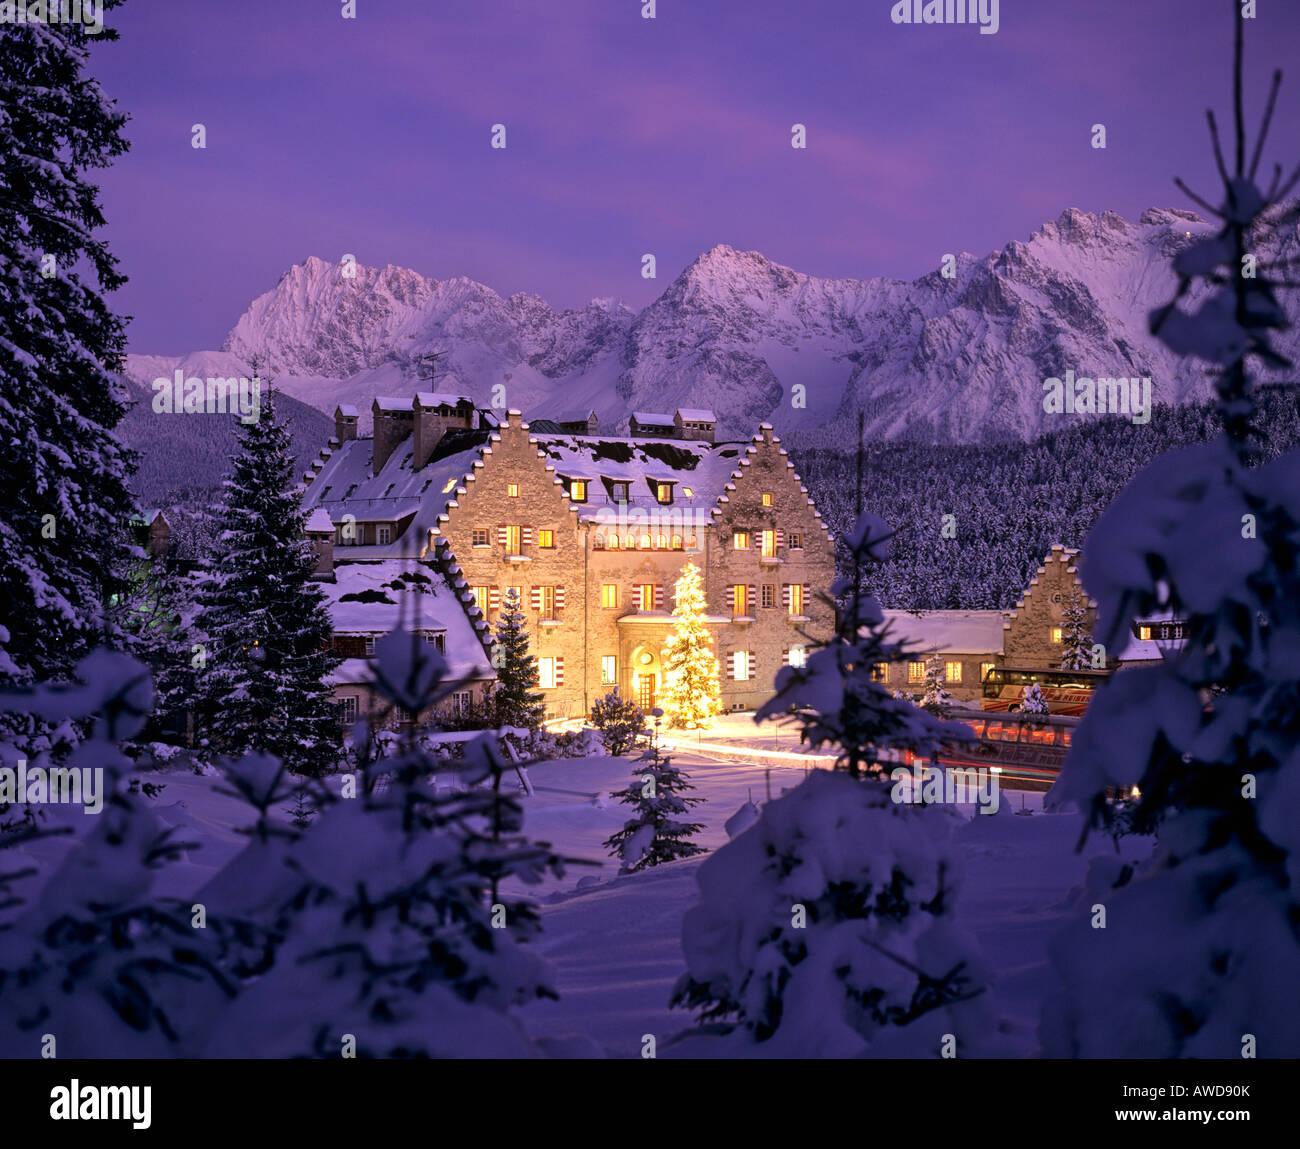 Kranzbach Castle in wintertime, Christmastime, Karwendel Range, Upper Bavaria, Bavaria, Germany, Europe - Stock Image